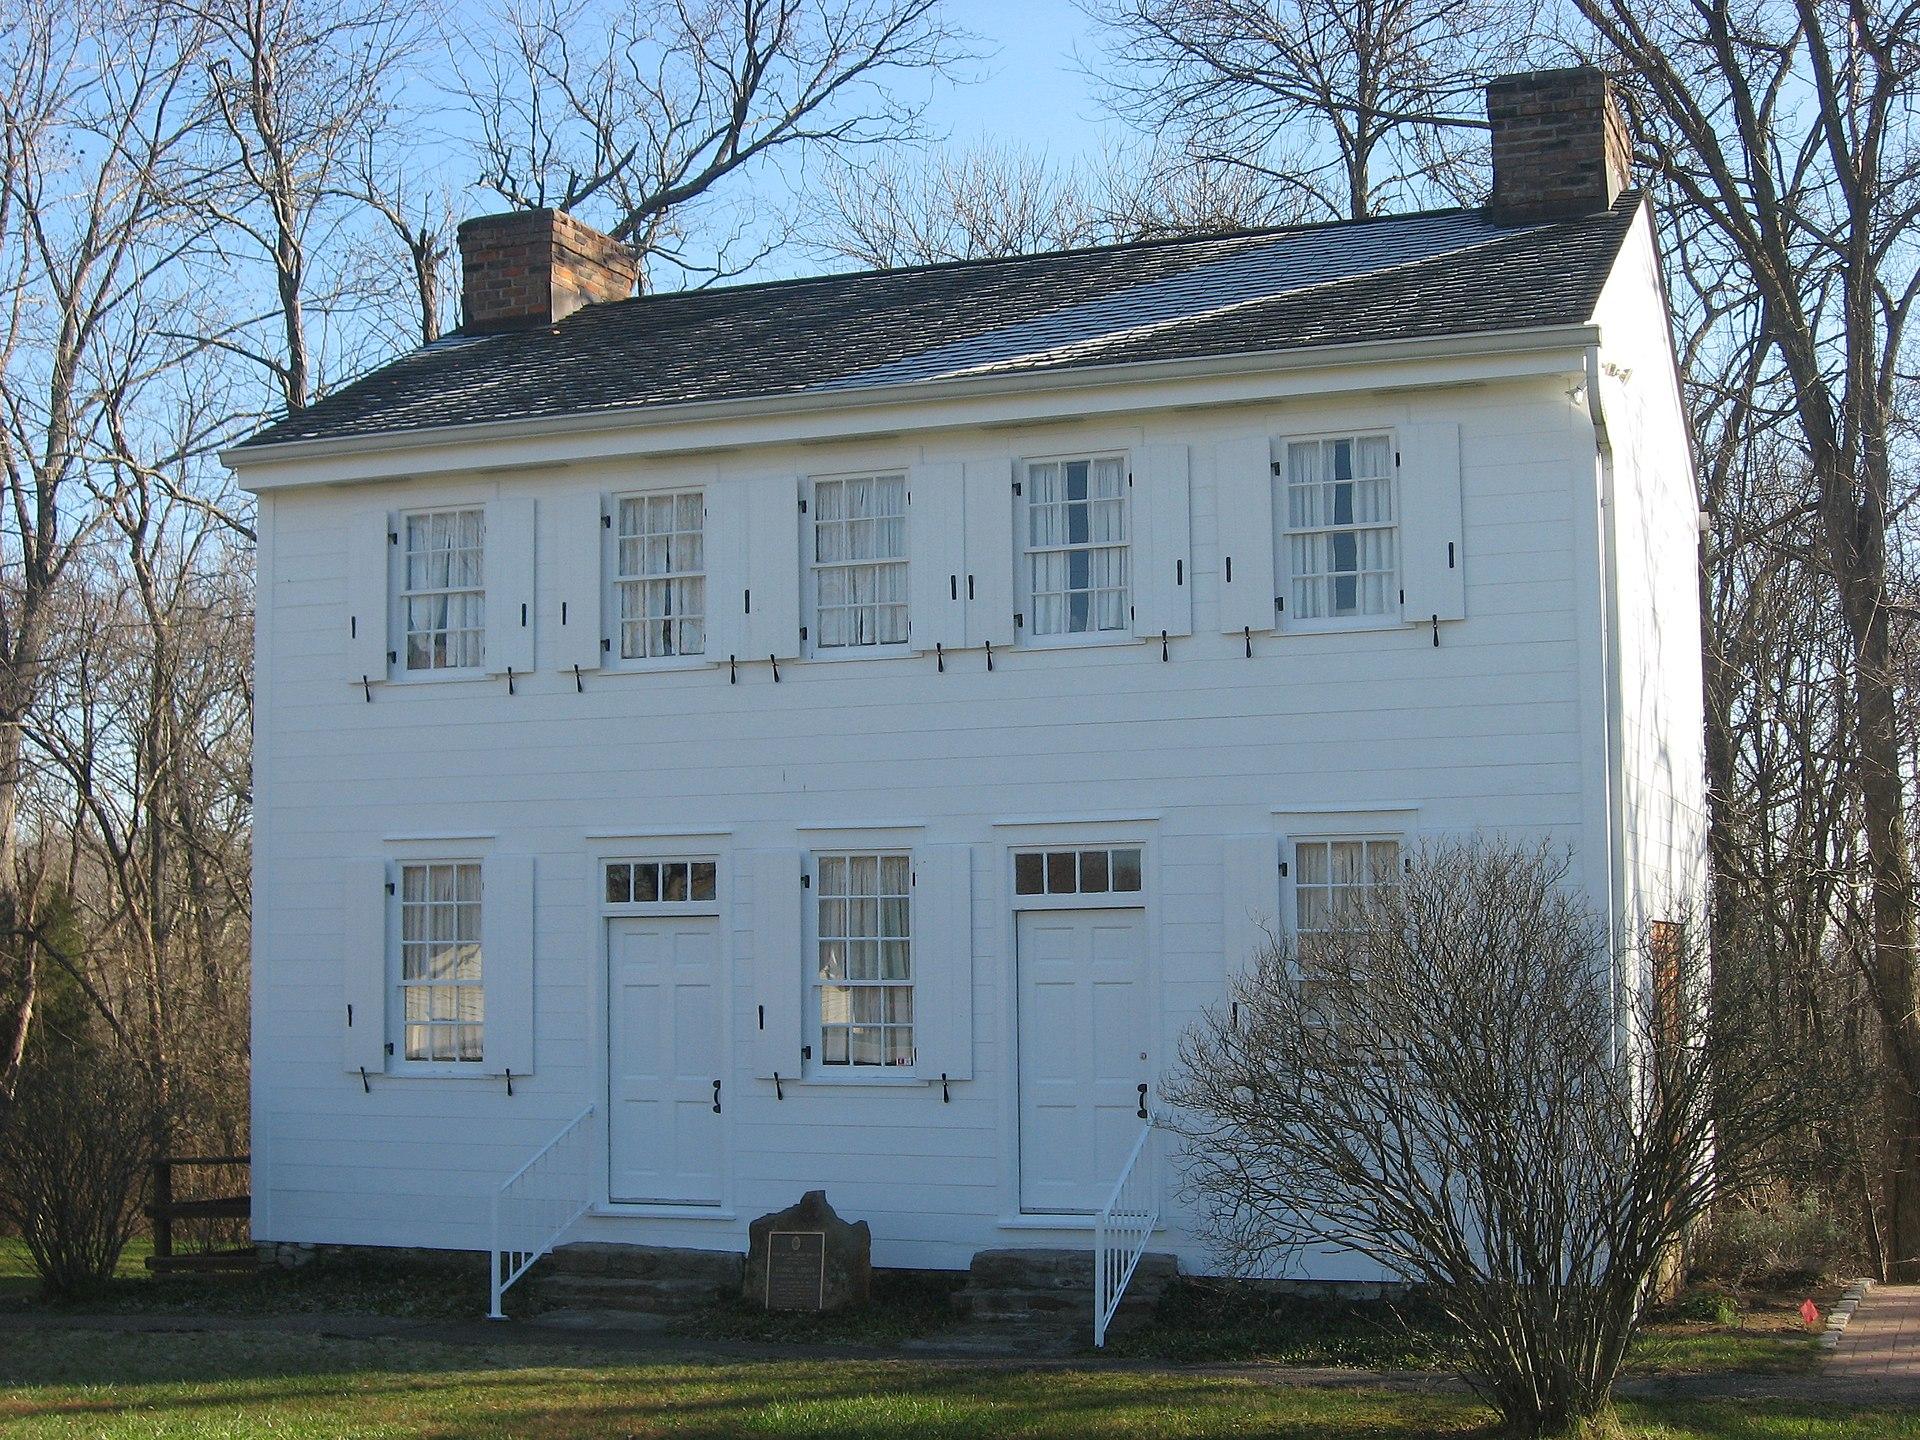 Free Front Elevation Images : Harrison township hamilton county ohio wikipedia